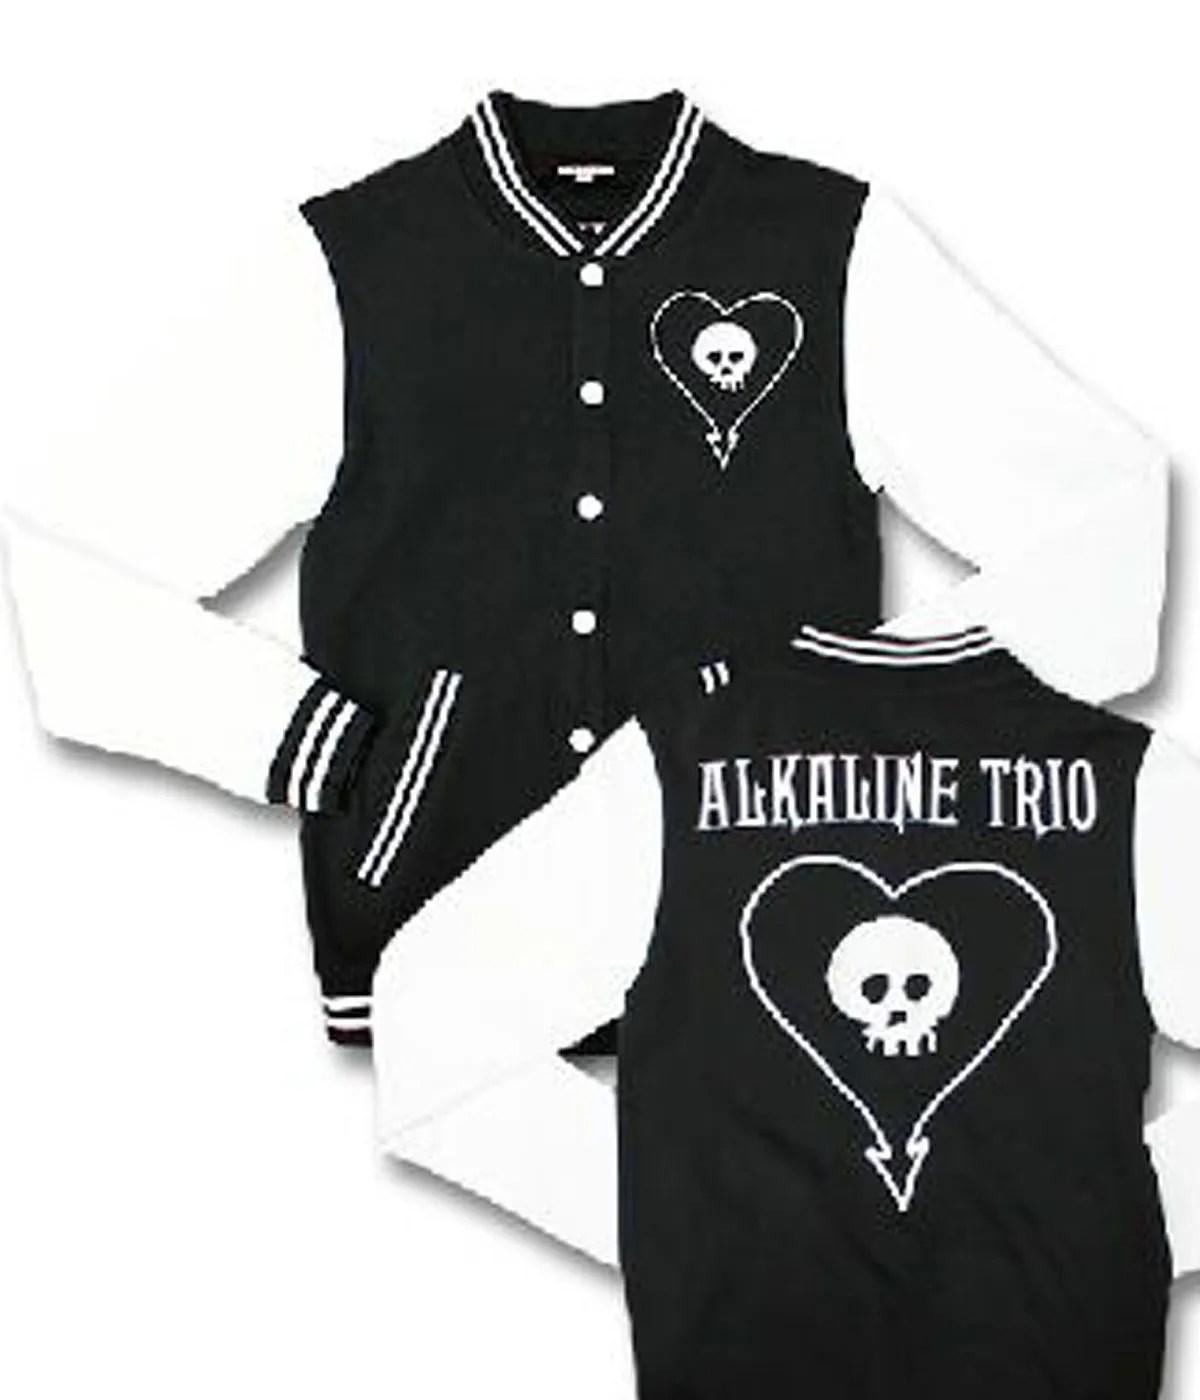 alkaline-trio-black-and-white-varsity-jacket